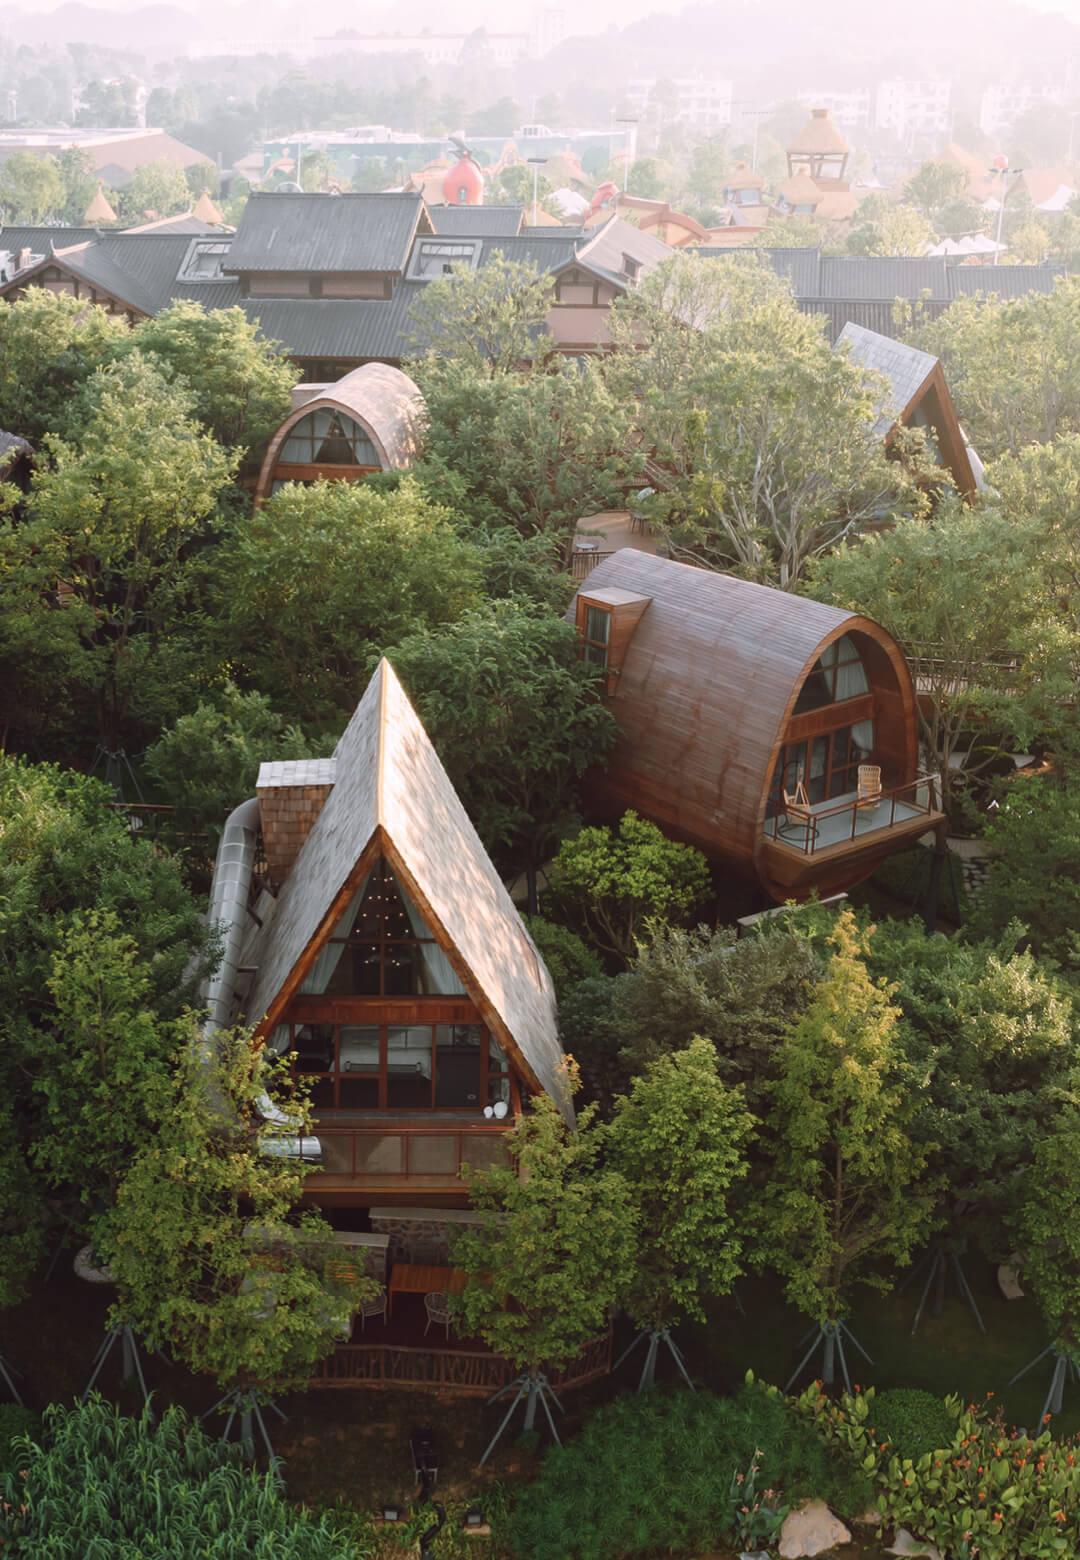 Guilin Lebei Homestay Hotel by Beijing-based architectural firm aoe | Guilin Lebei Homestay Hotel by aoe | STIRworld